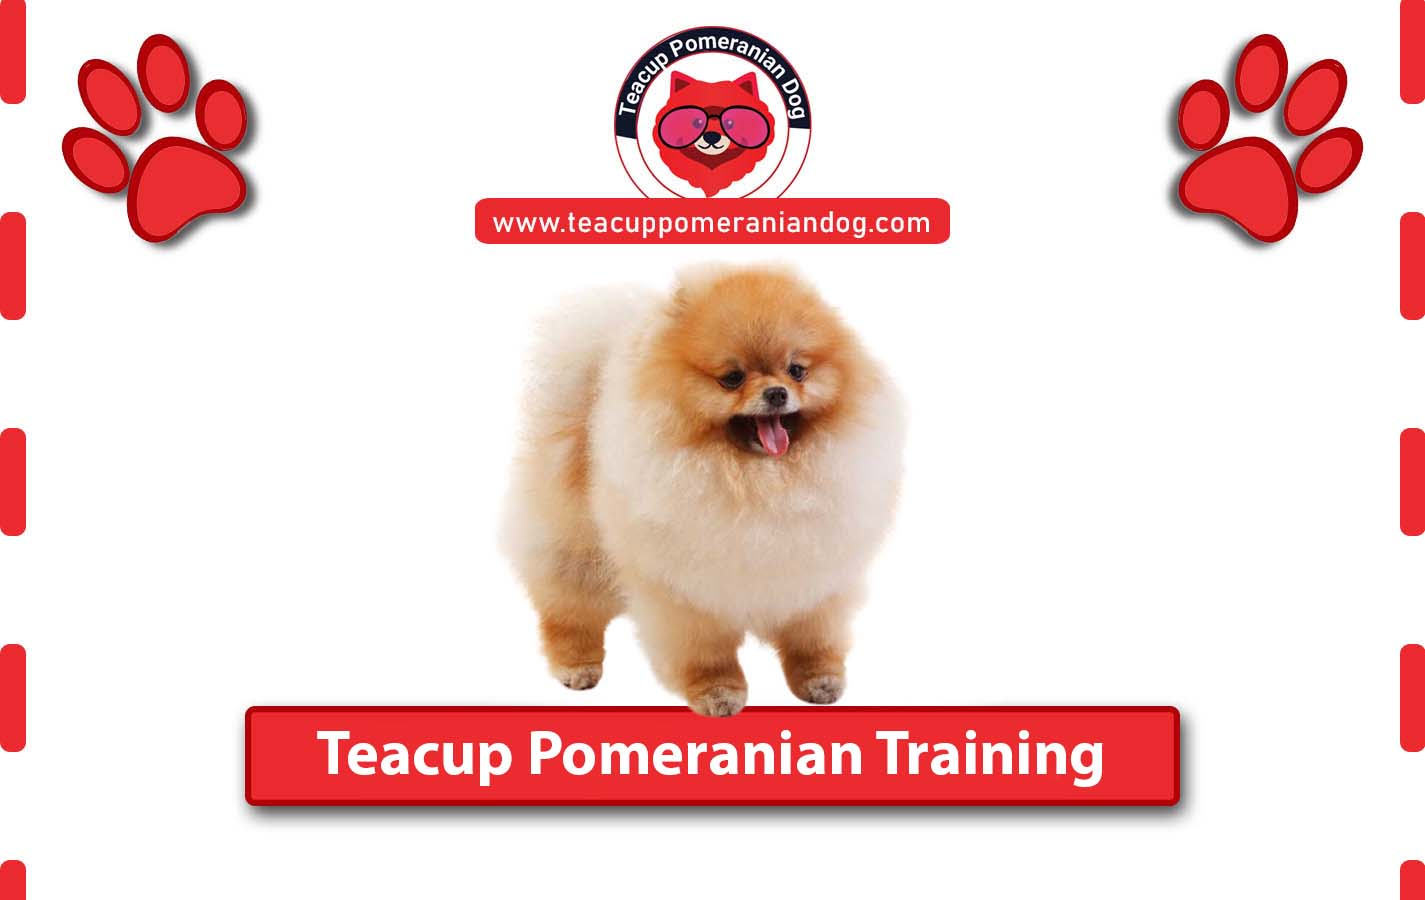 Teacup Pomeranian Training